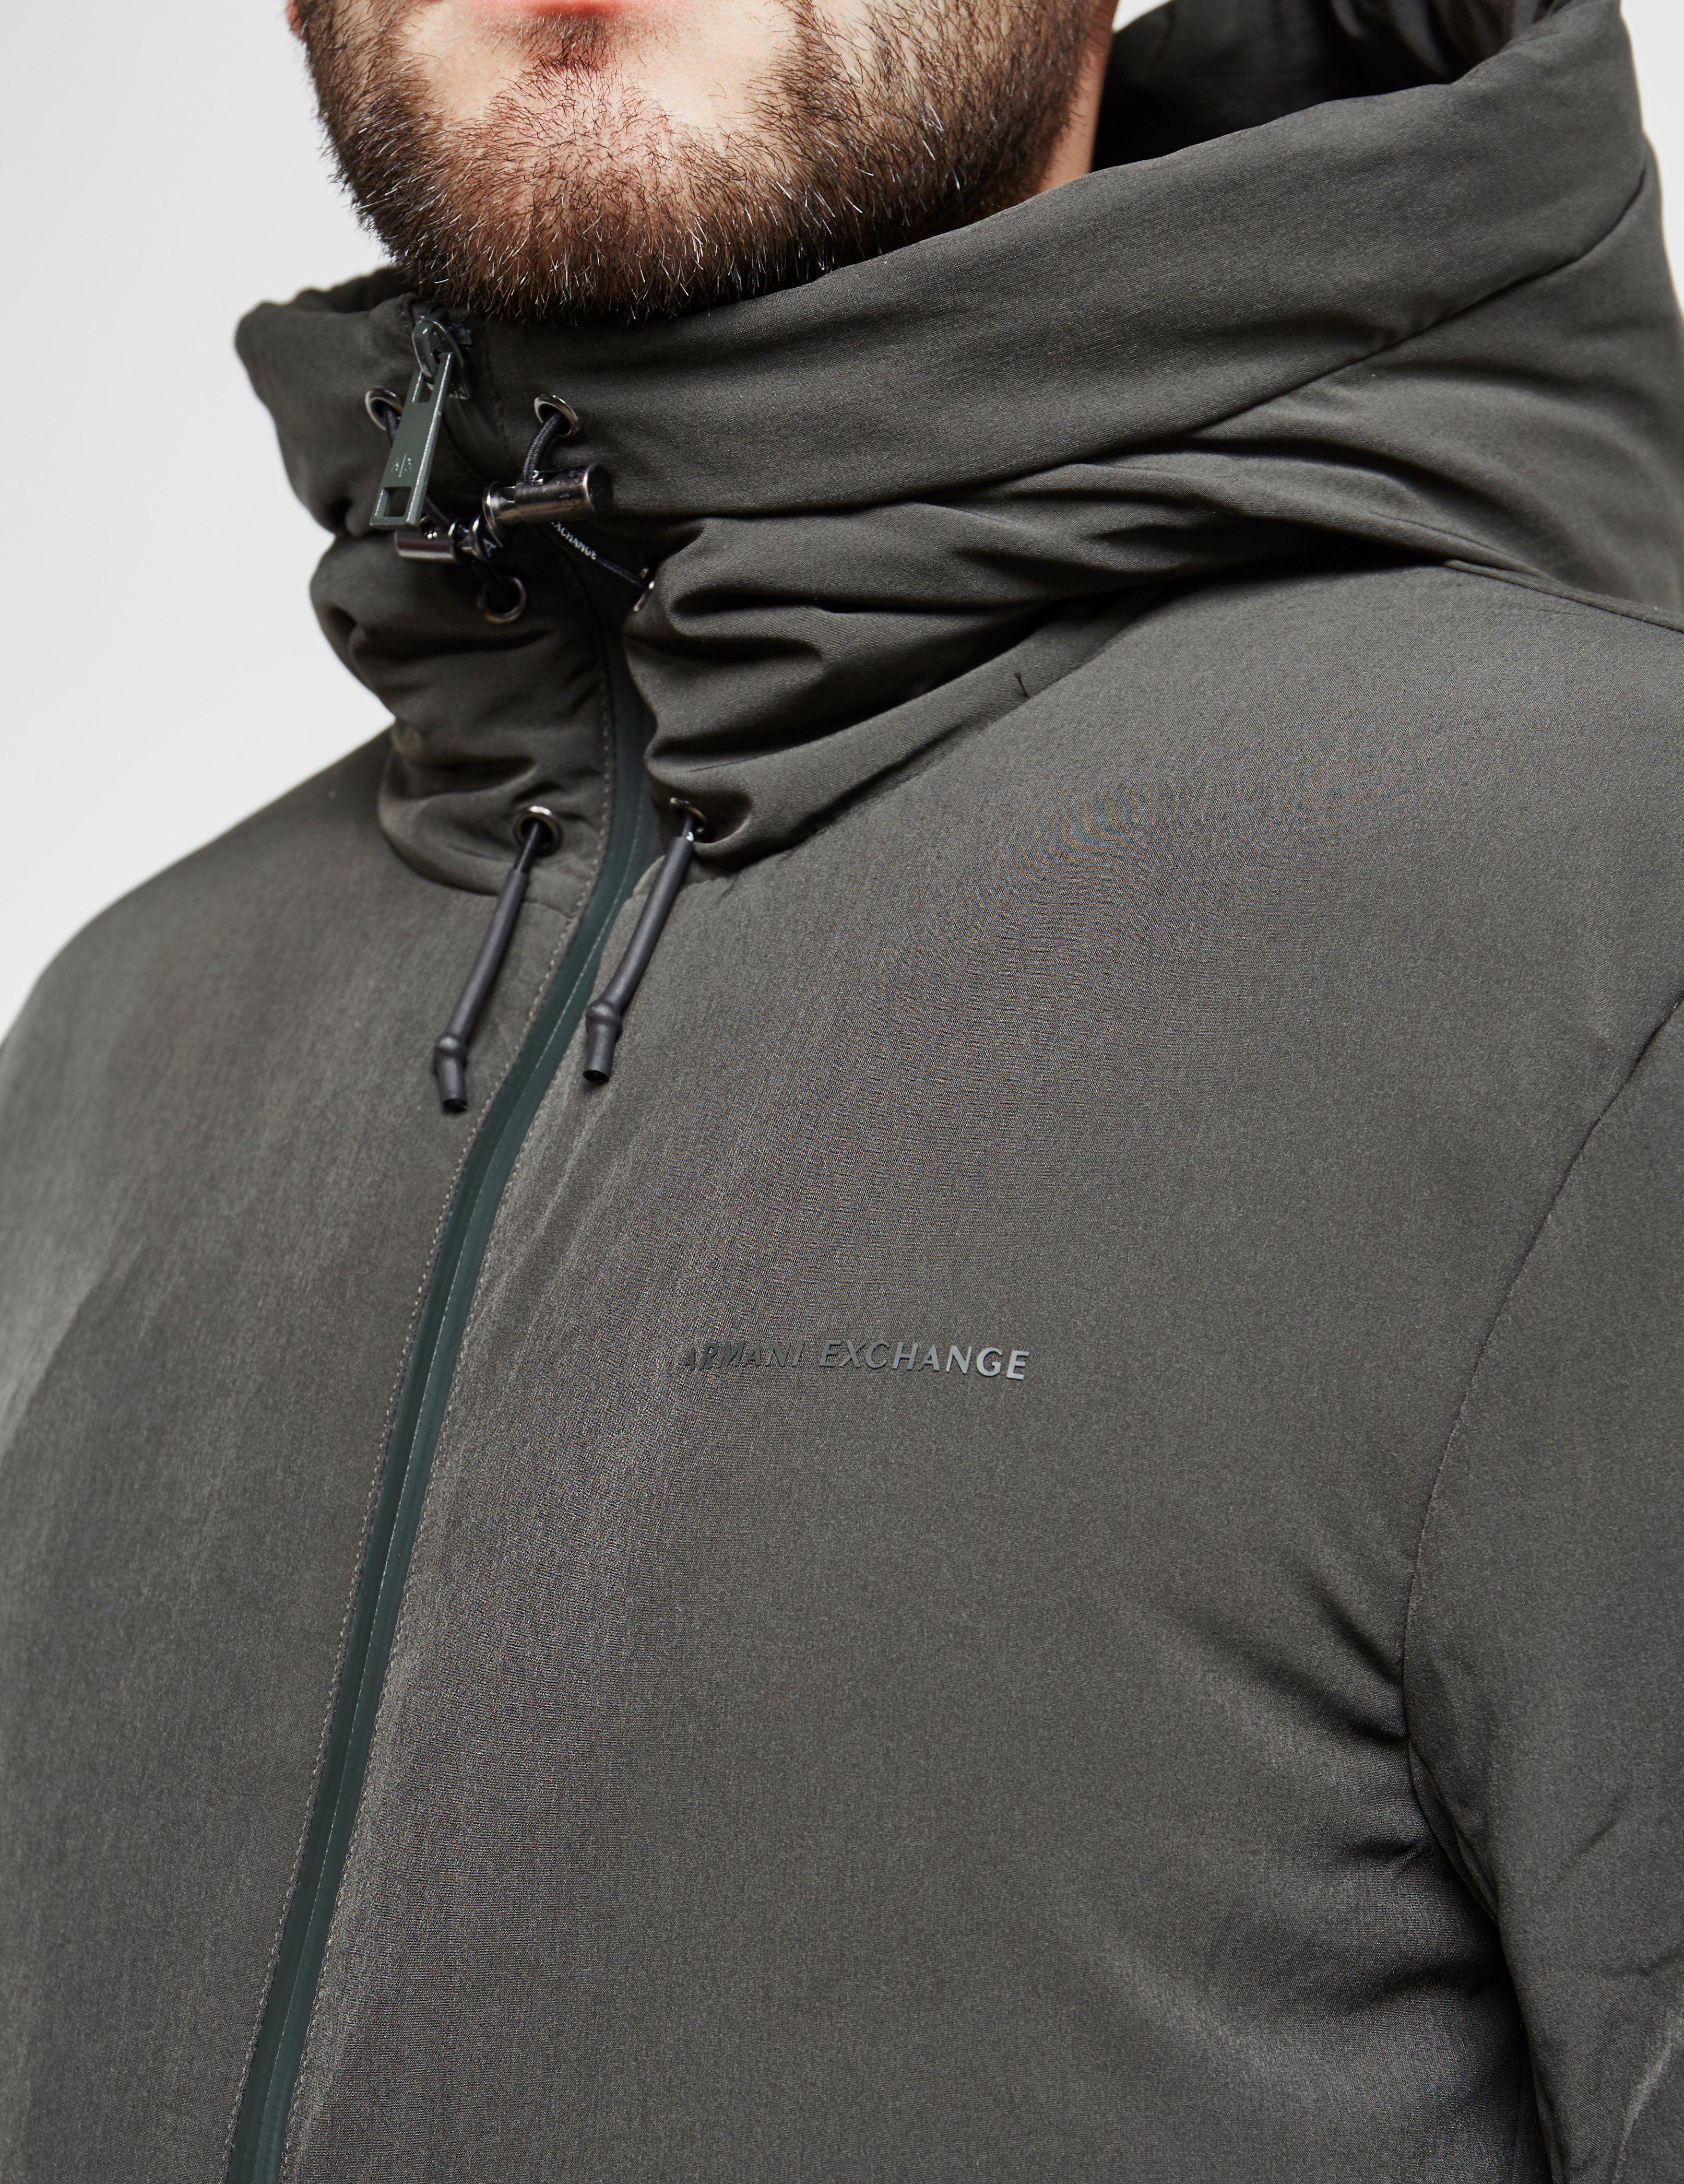 Armani Exchange Protek Padded Jacket